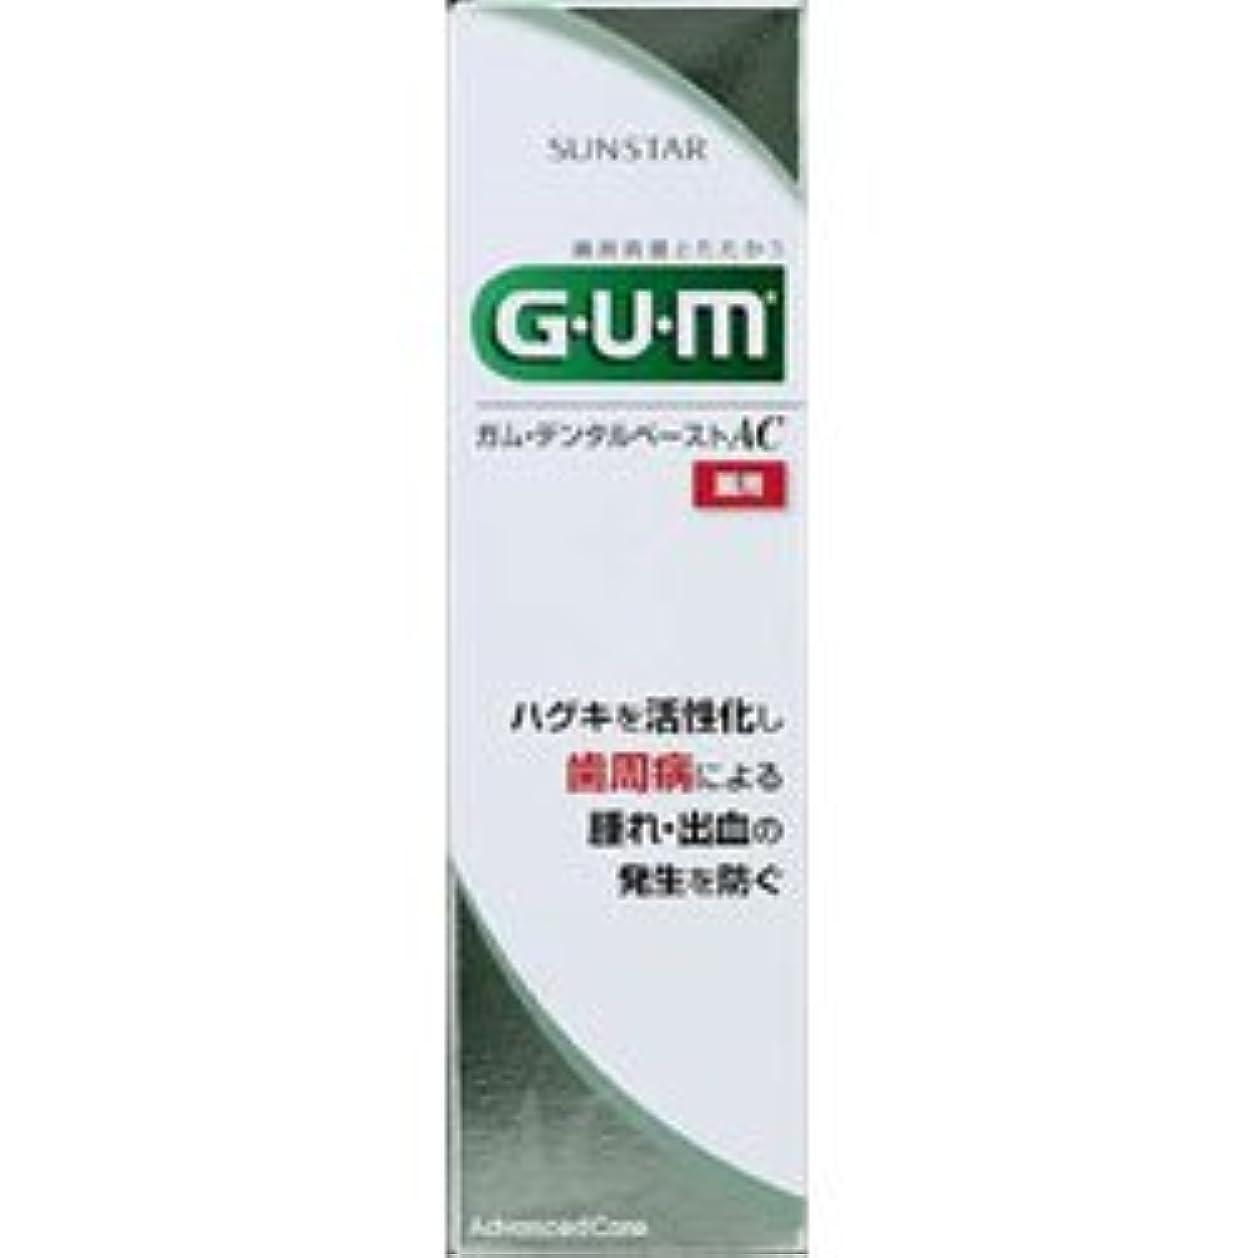 GUM(ガム) デンタルペーストAC 90g 【医薬部外品】【10点セット】